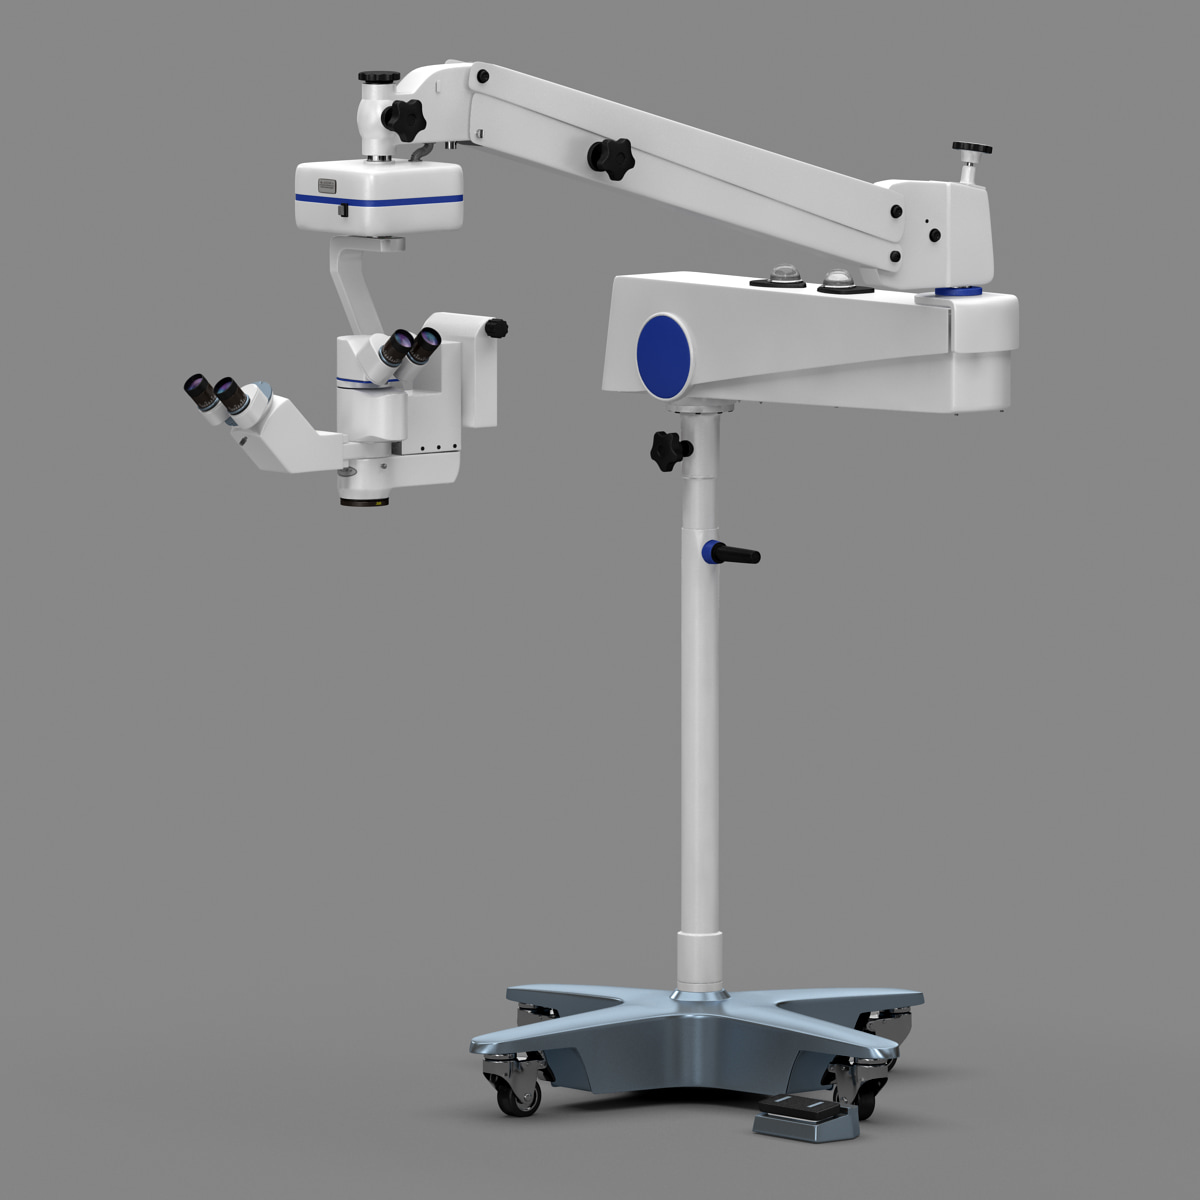 3d model of surgical microscope asom 4